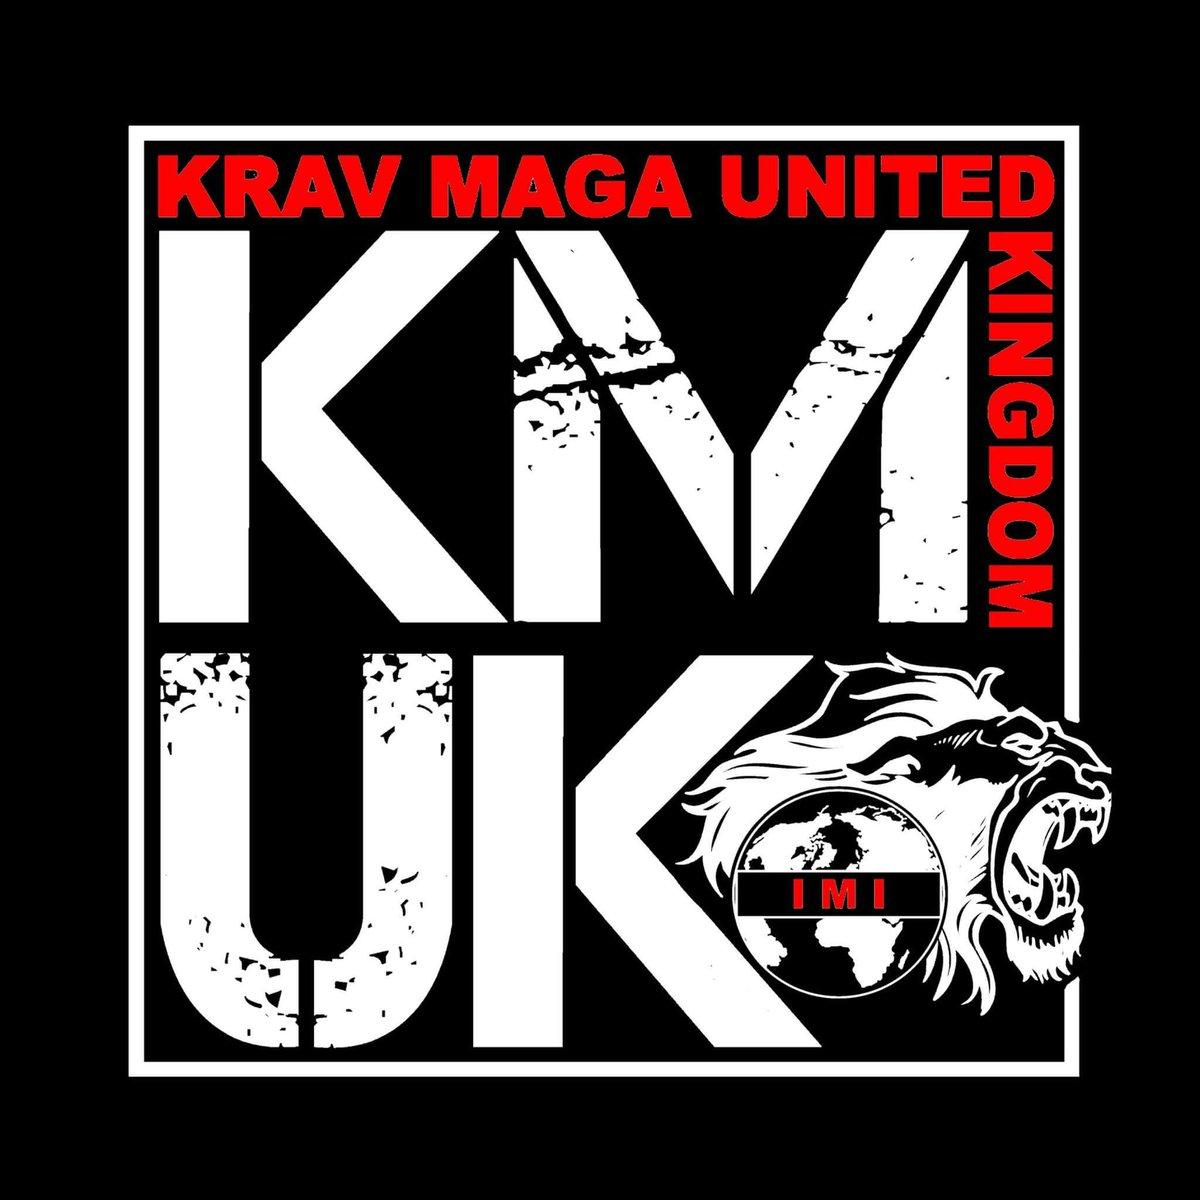 Krav maga united kravmagaunited twitter 0 replies 24 retweets 14 likes buycottarizona